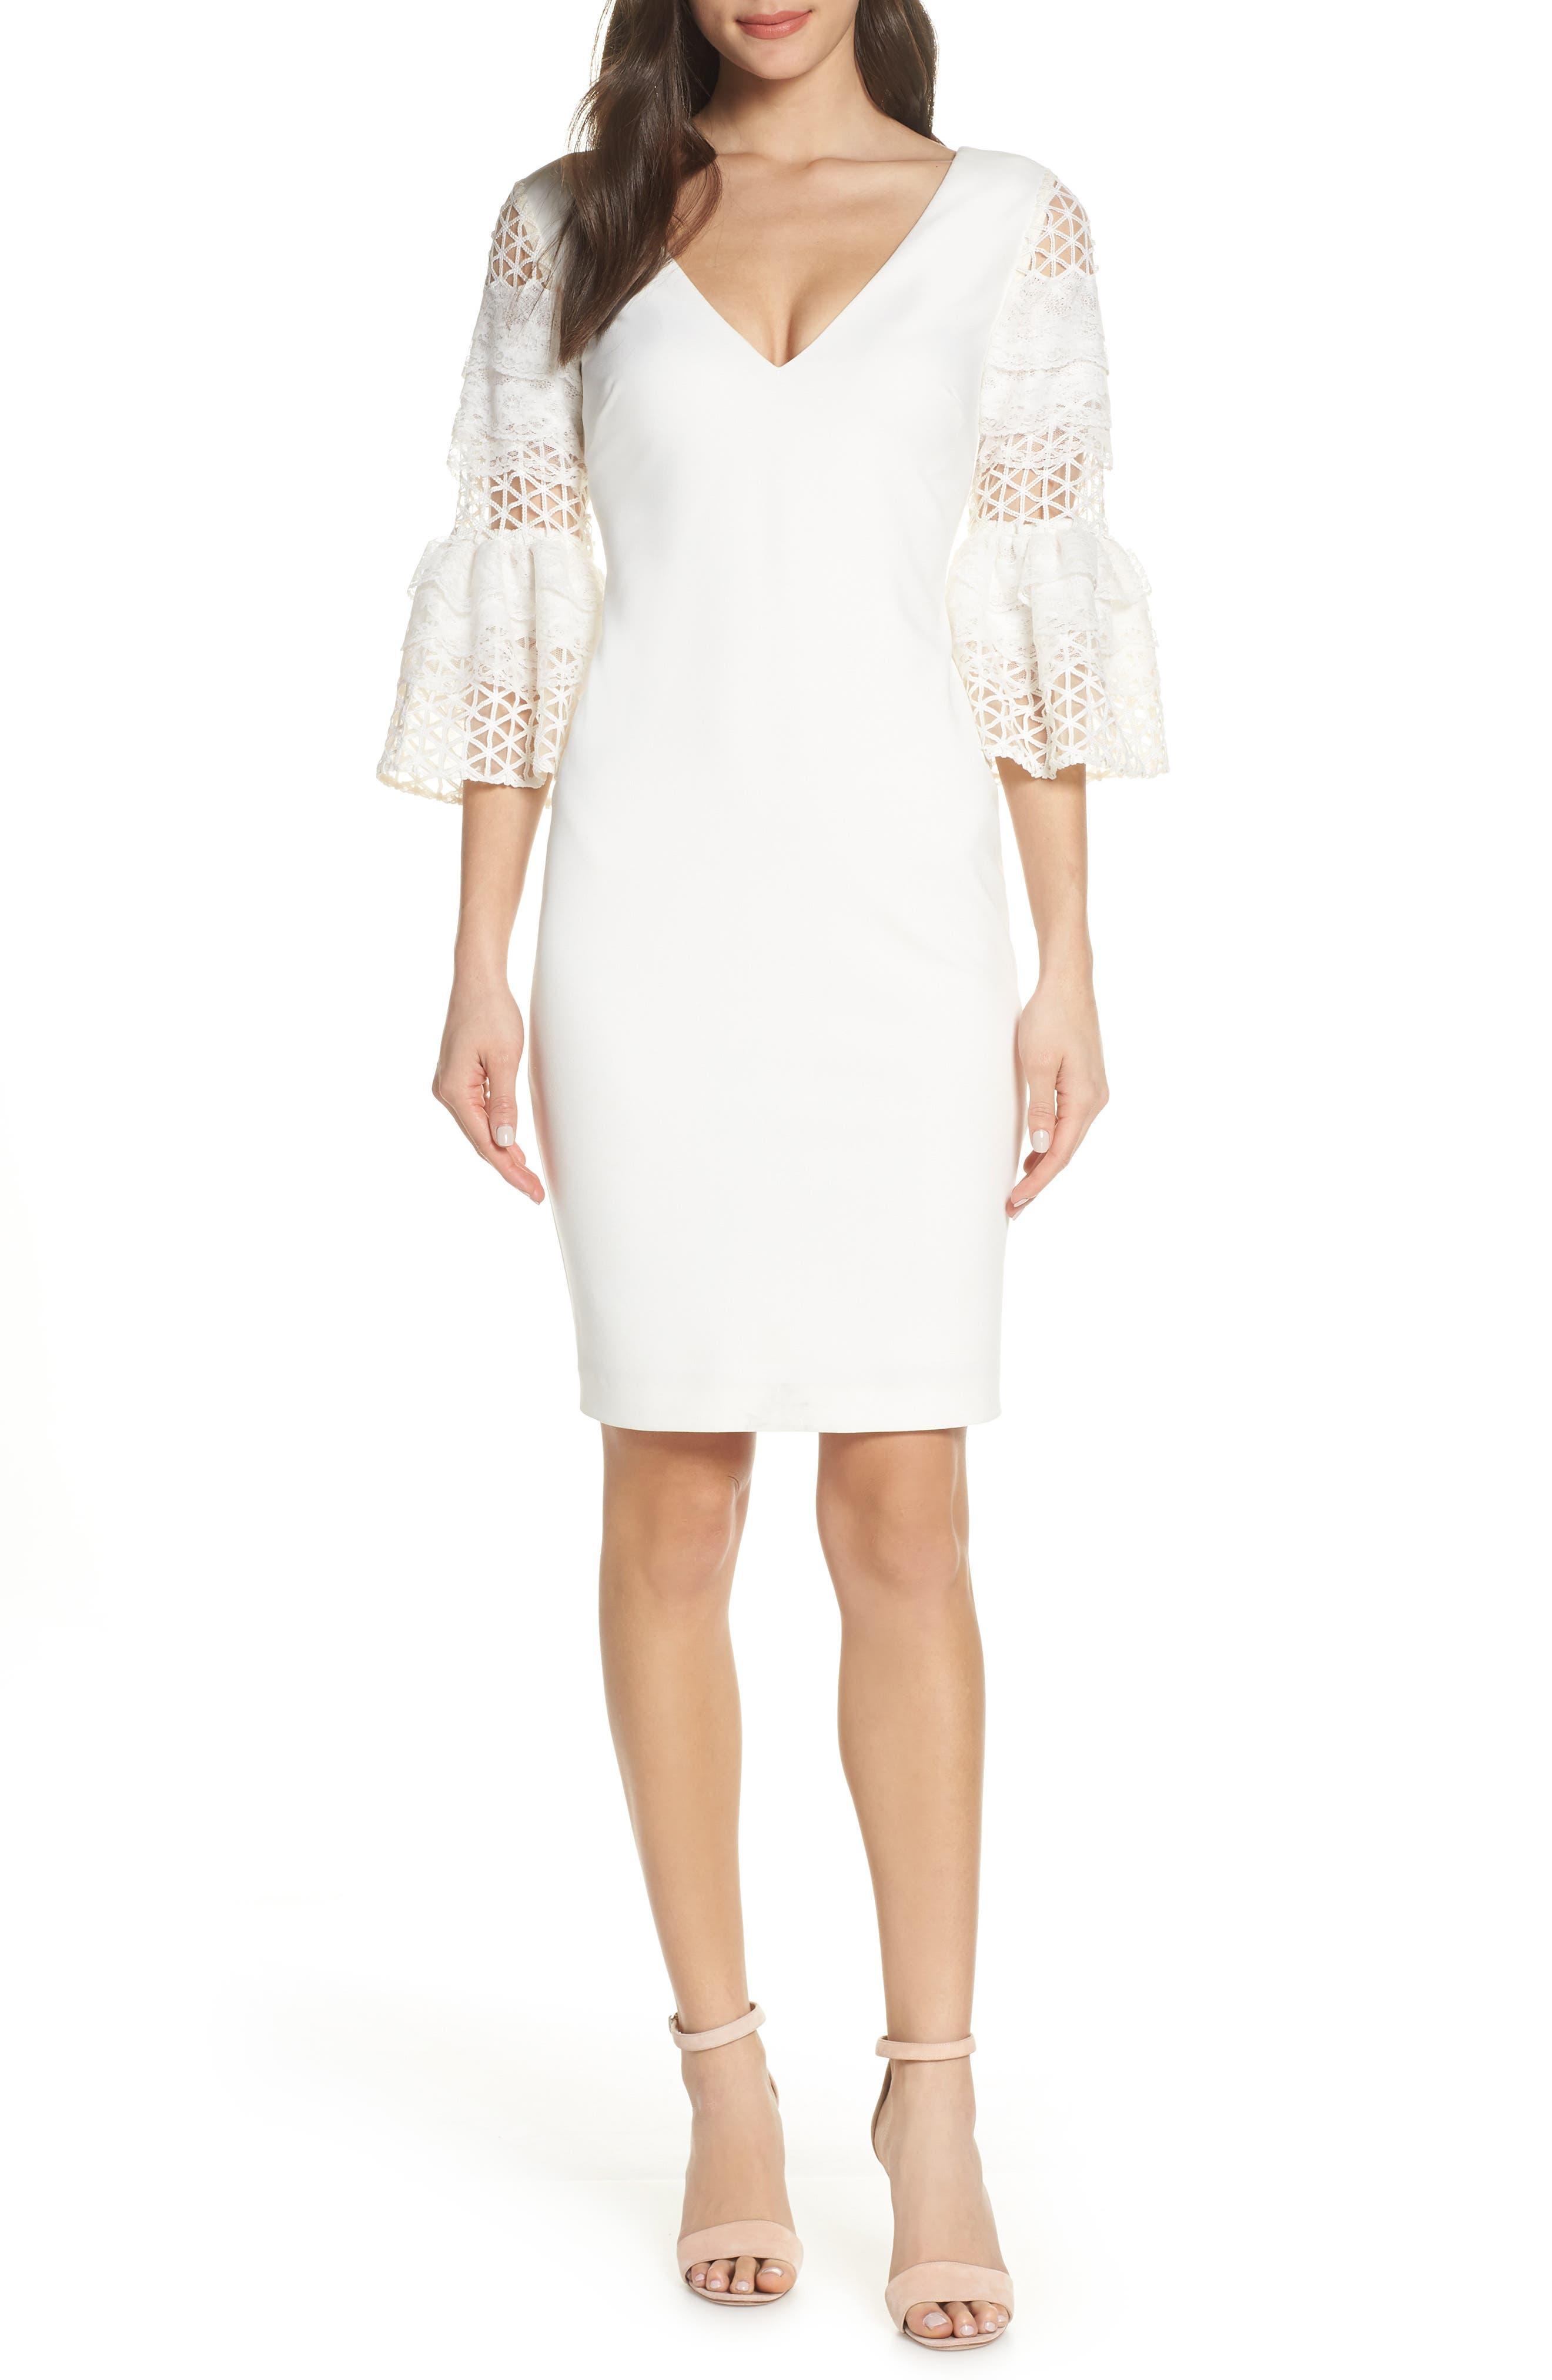 Mark + James By Badgley Mischka Lace Sleeve Sheath Dress, White